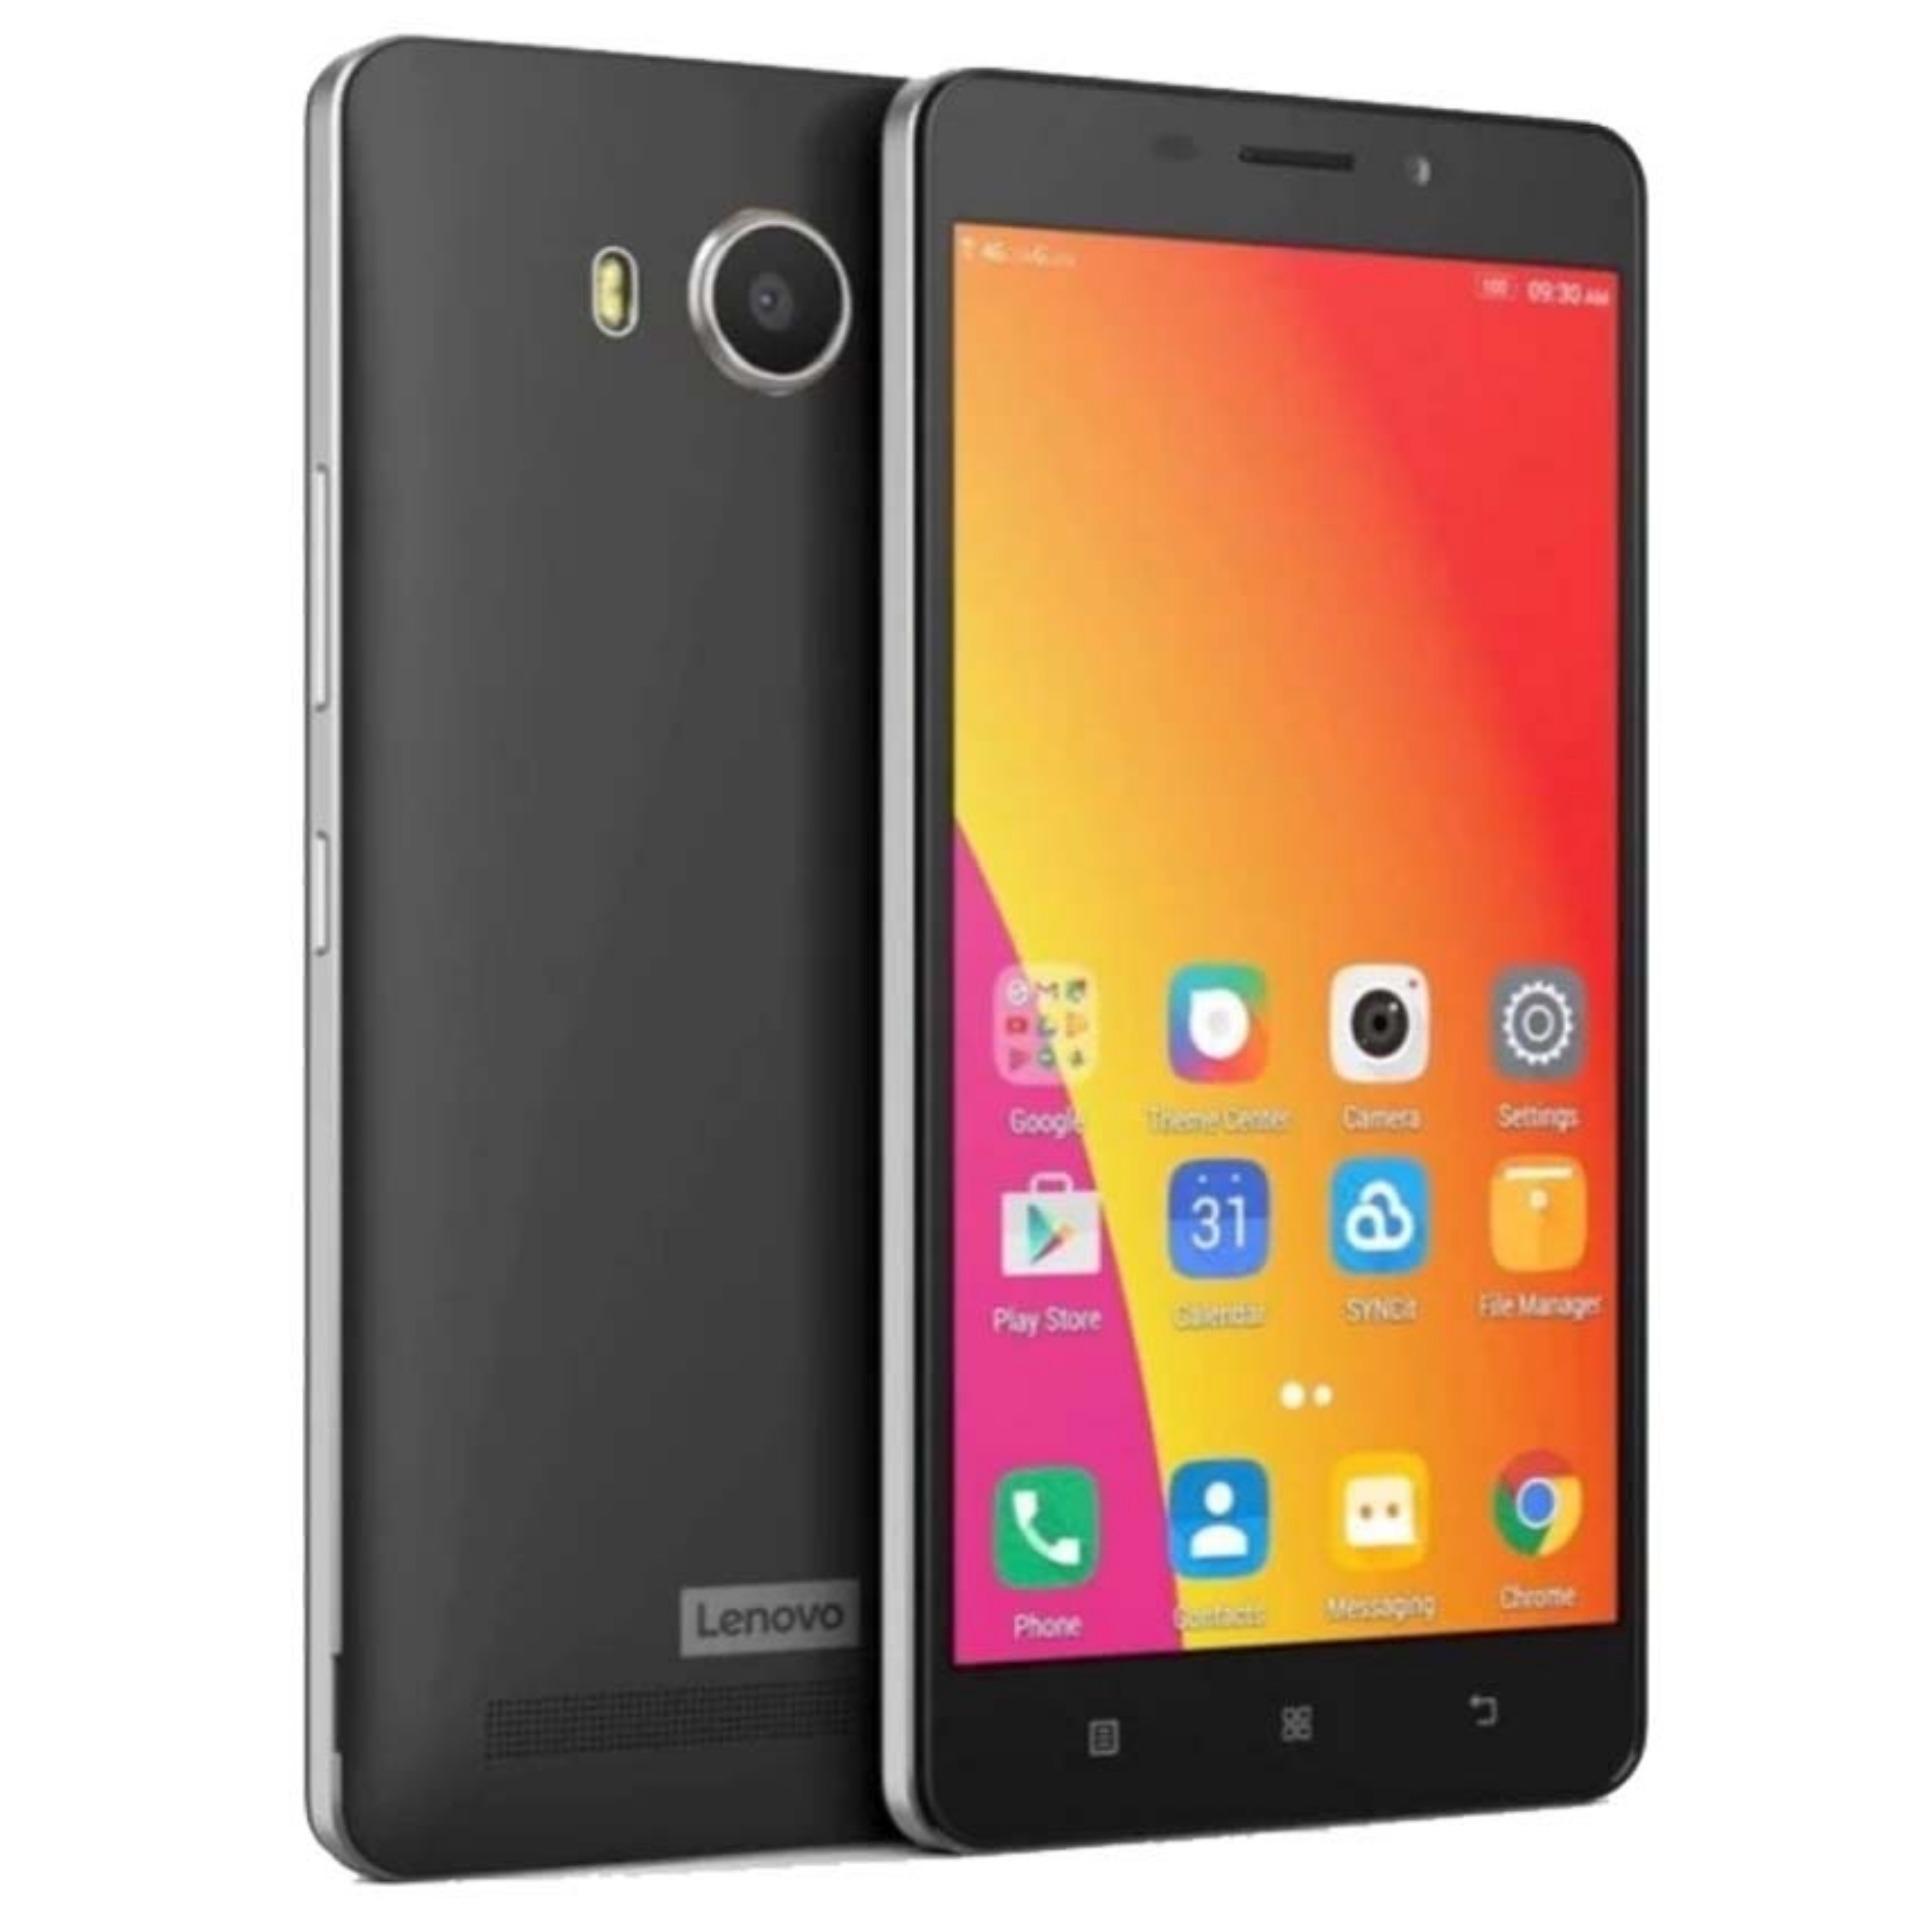 ... Lenovo A7700 4G LTE - Ram 2GB/16GB - Black